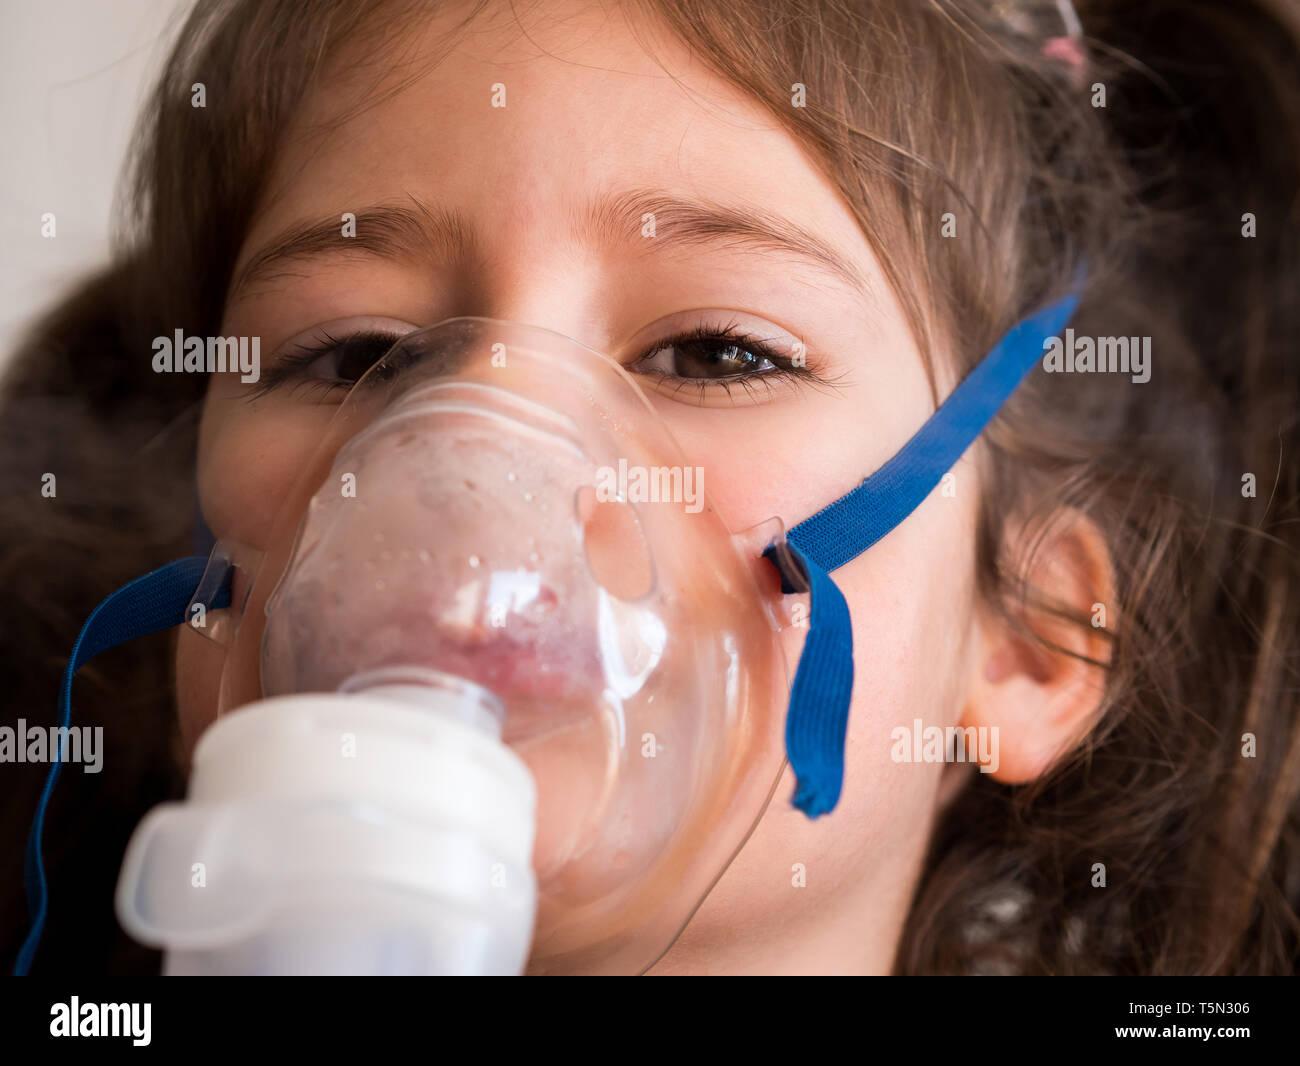 Cute small girl inhaling with inhalator close up - Stock Image